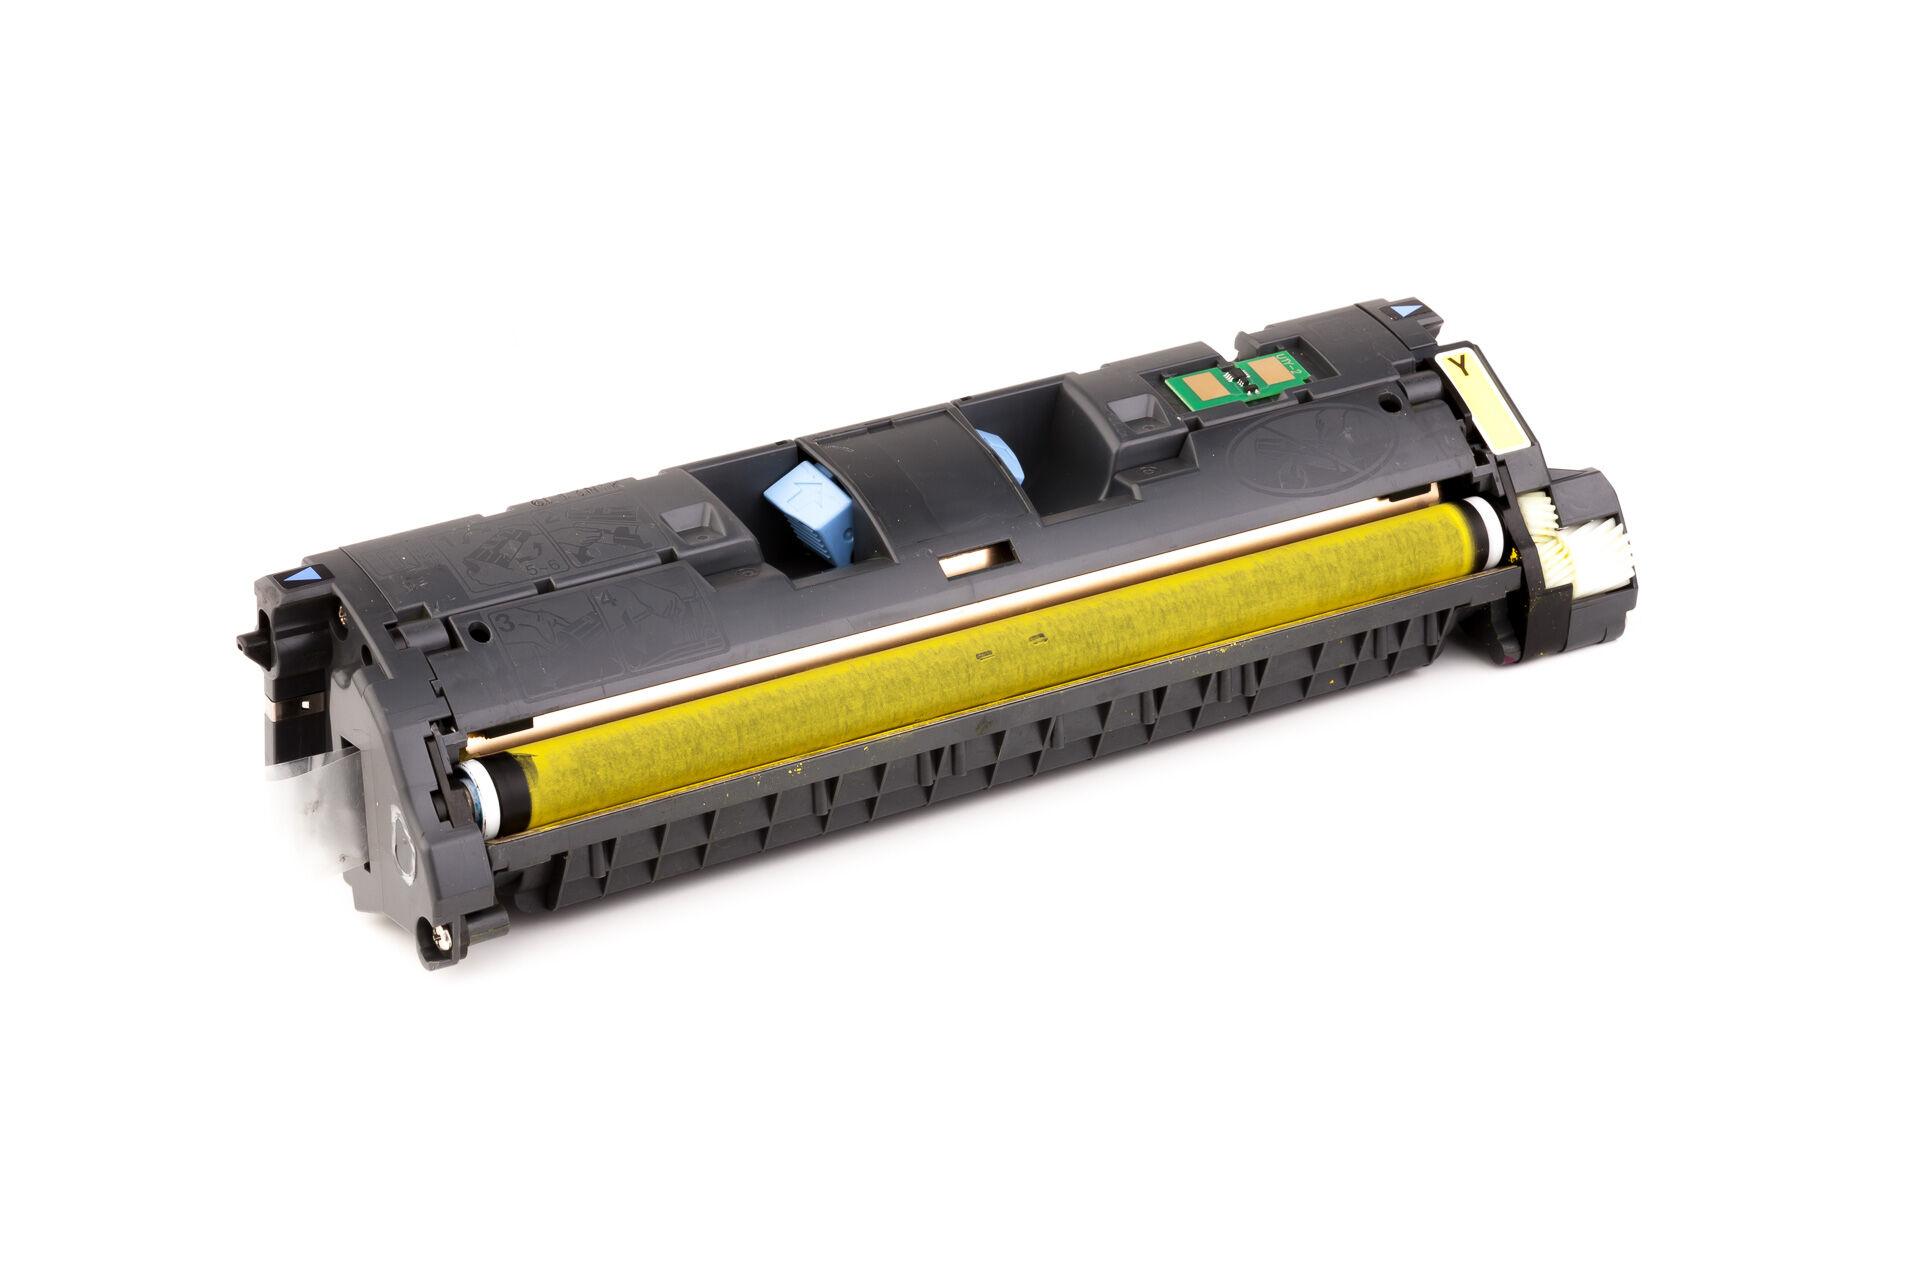 Canon Cartouche de Toner pour Canon 7430A003 / EP-87 Y jaune compatible (de marque ASC)